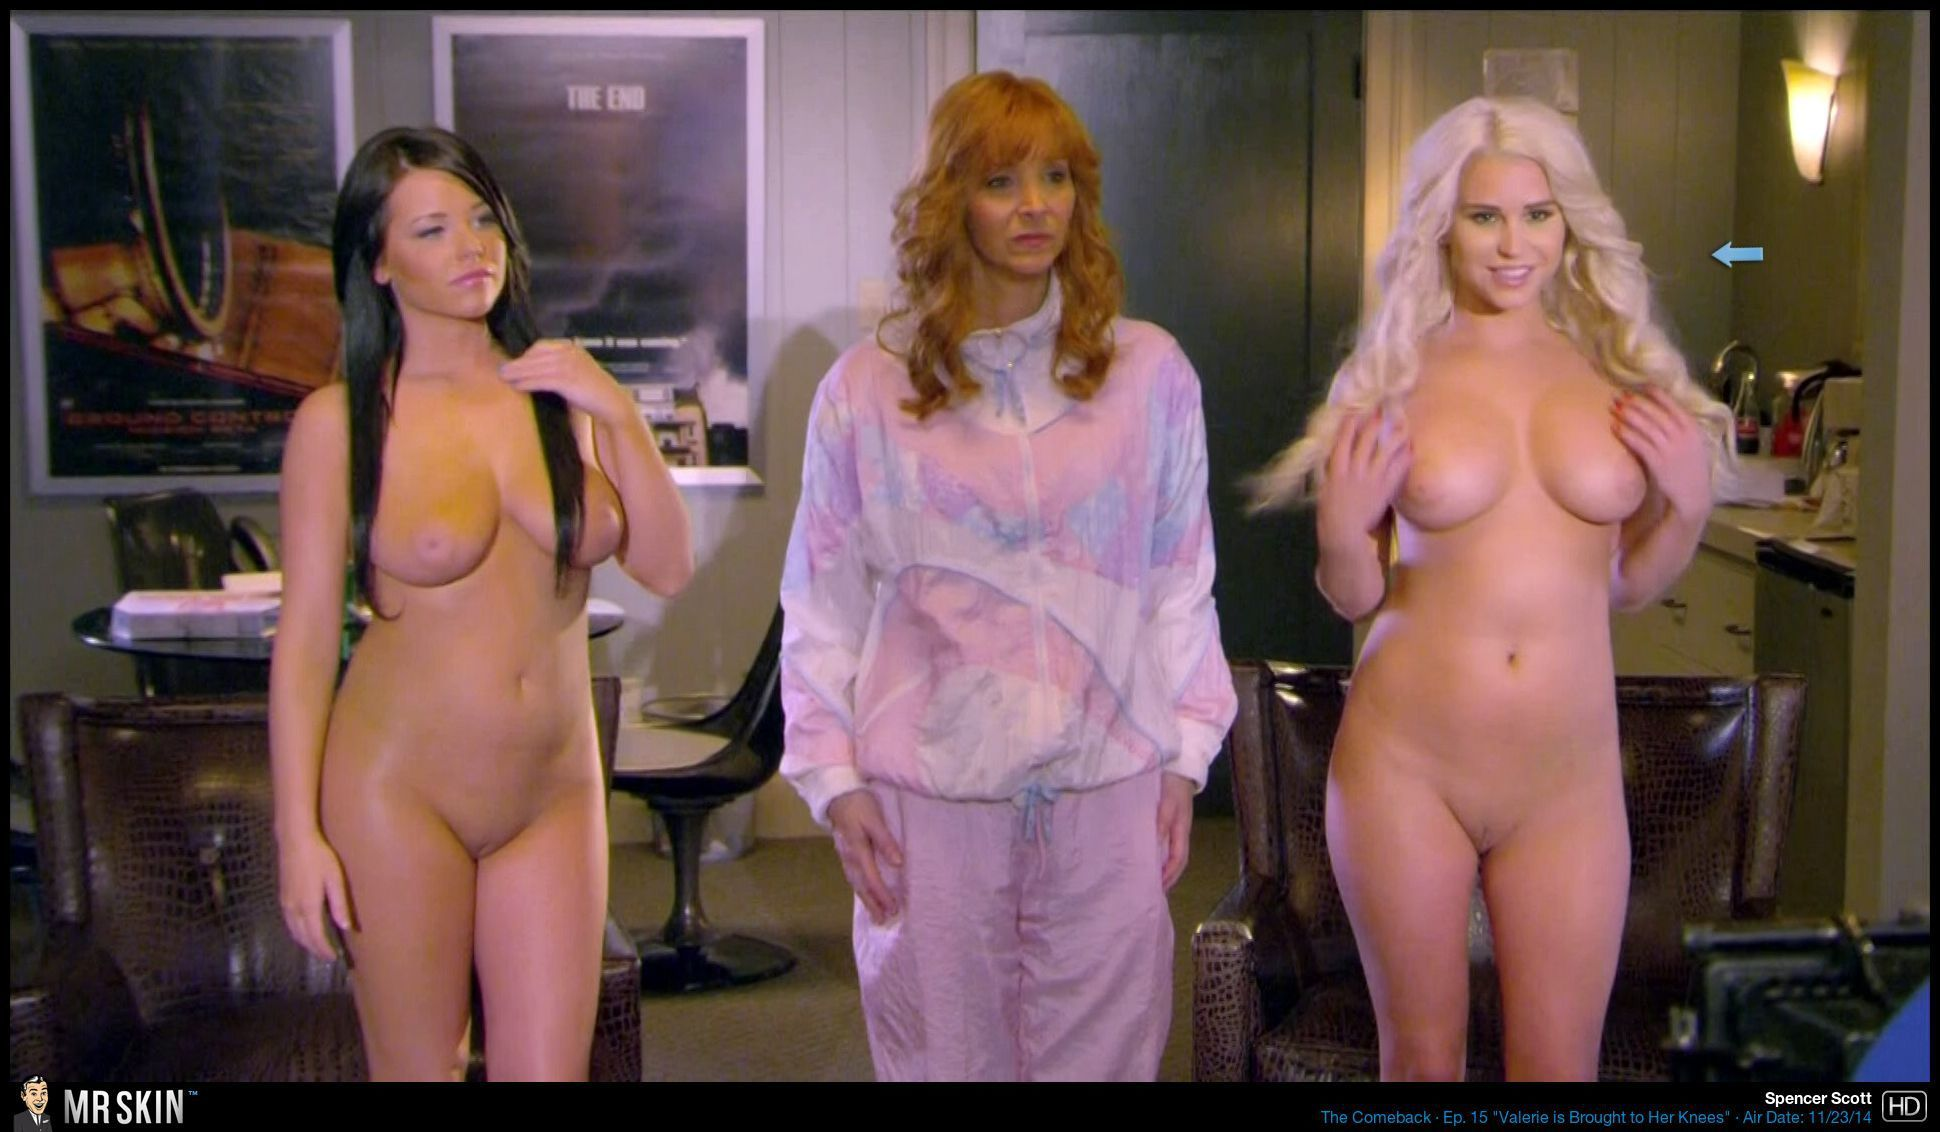 full-frontal-tv-nudity